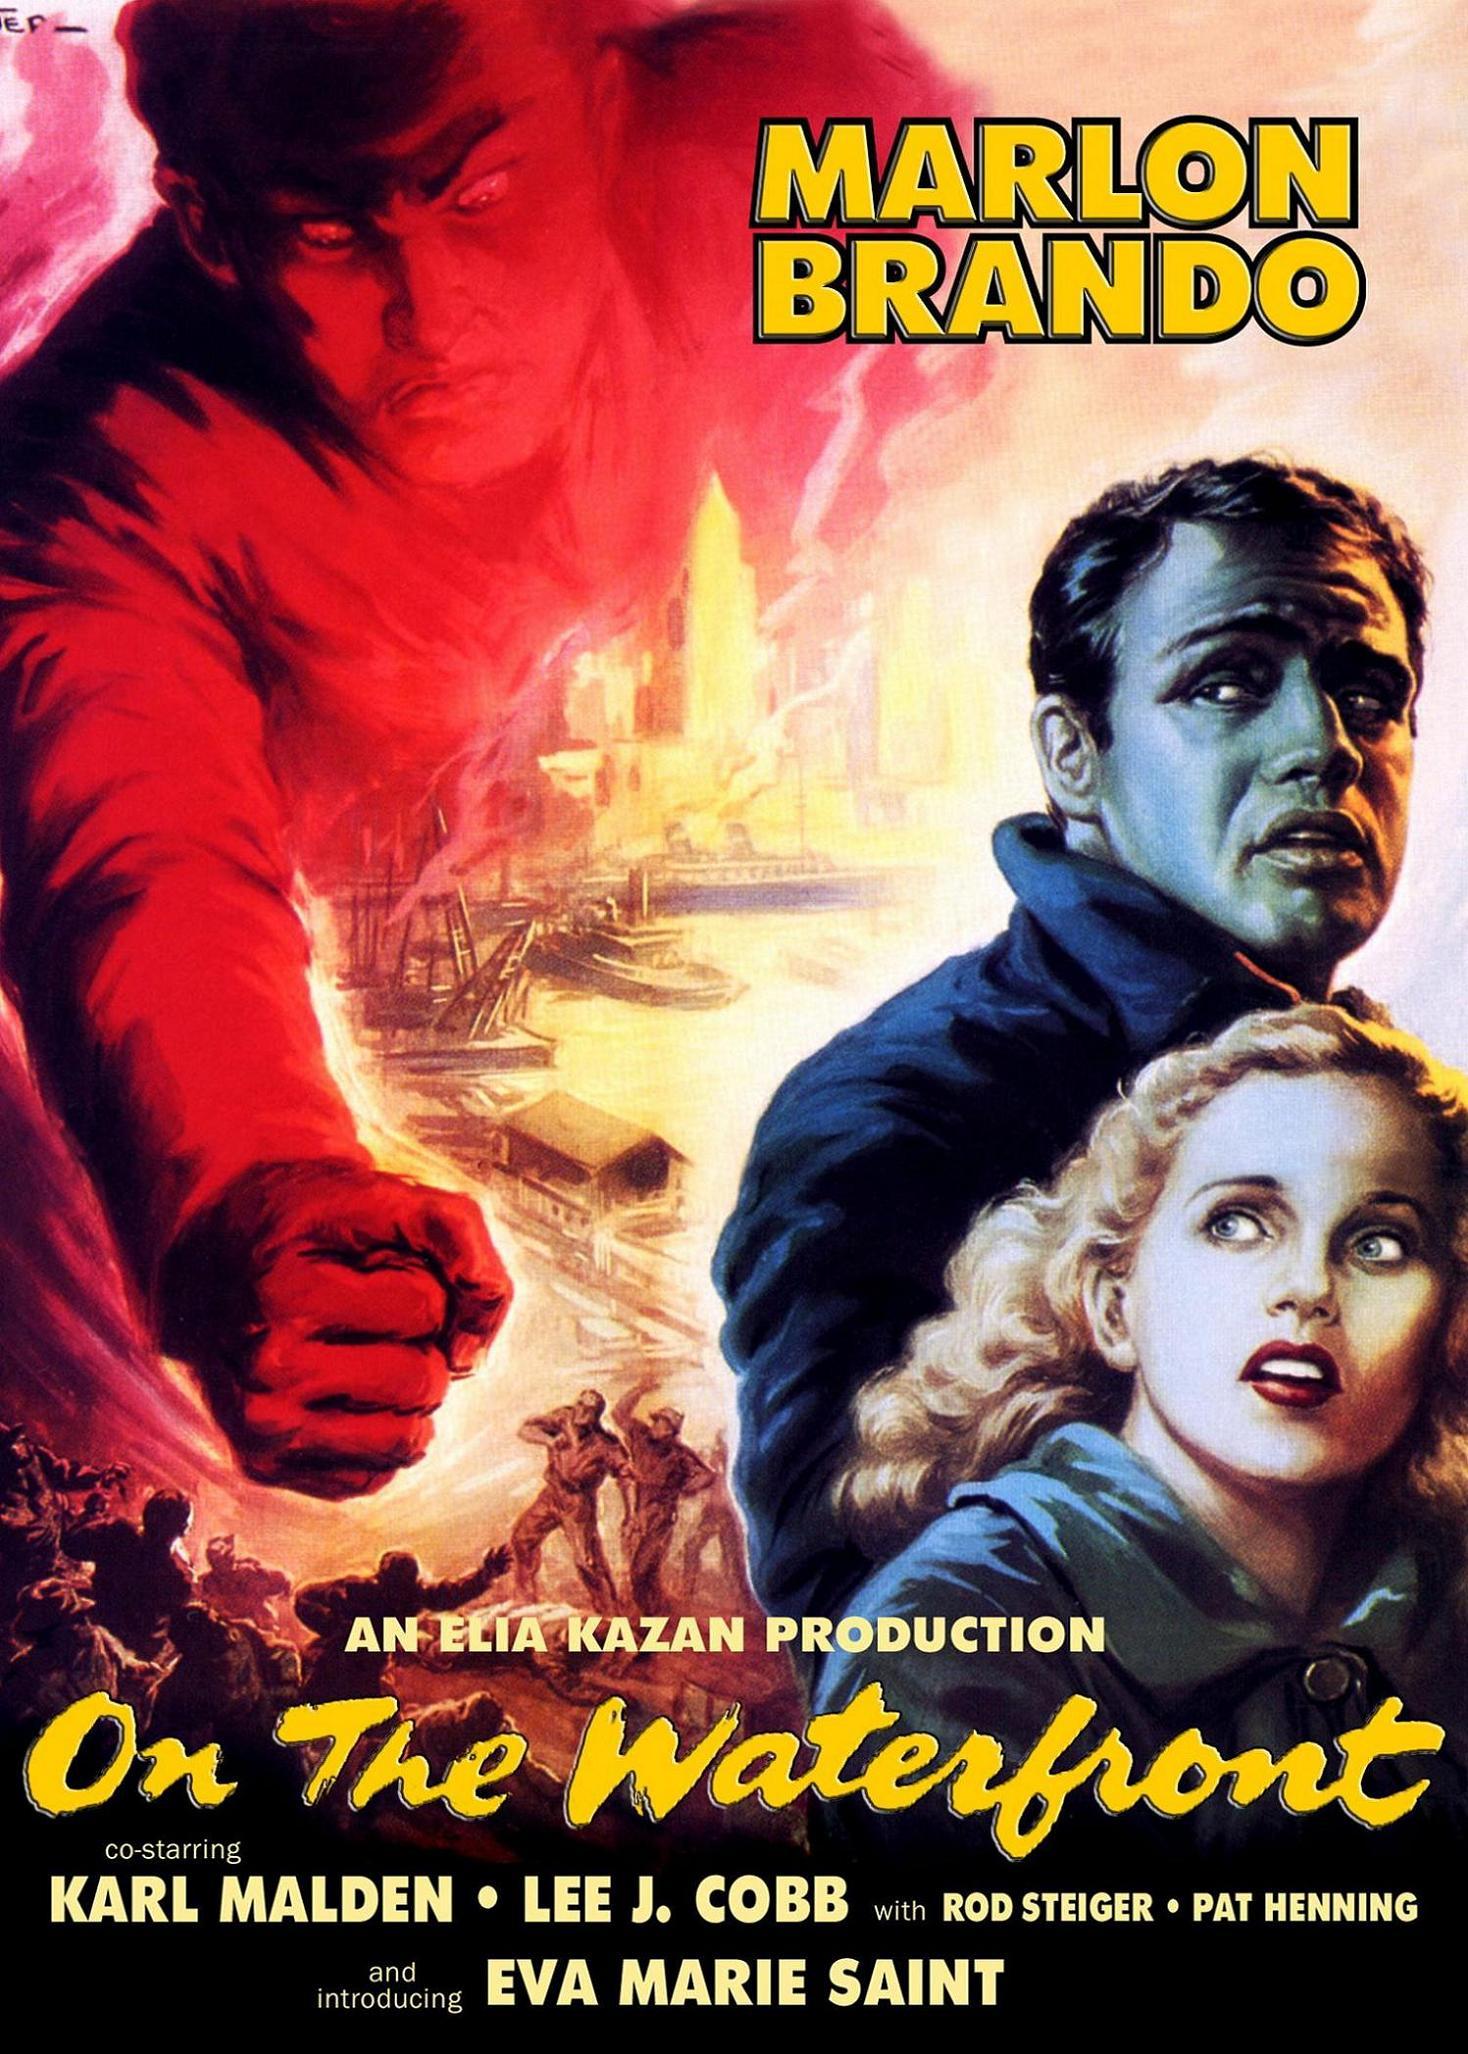 On-the-Waterfront-1954-USA-Movie-Poster-Starring-Marlon-Brando2.jpg